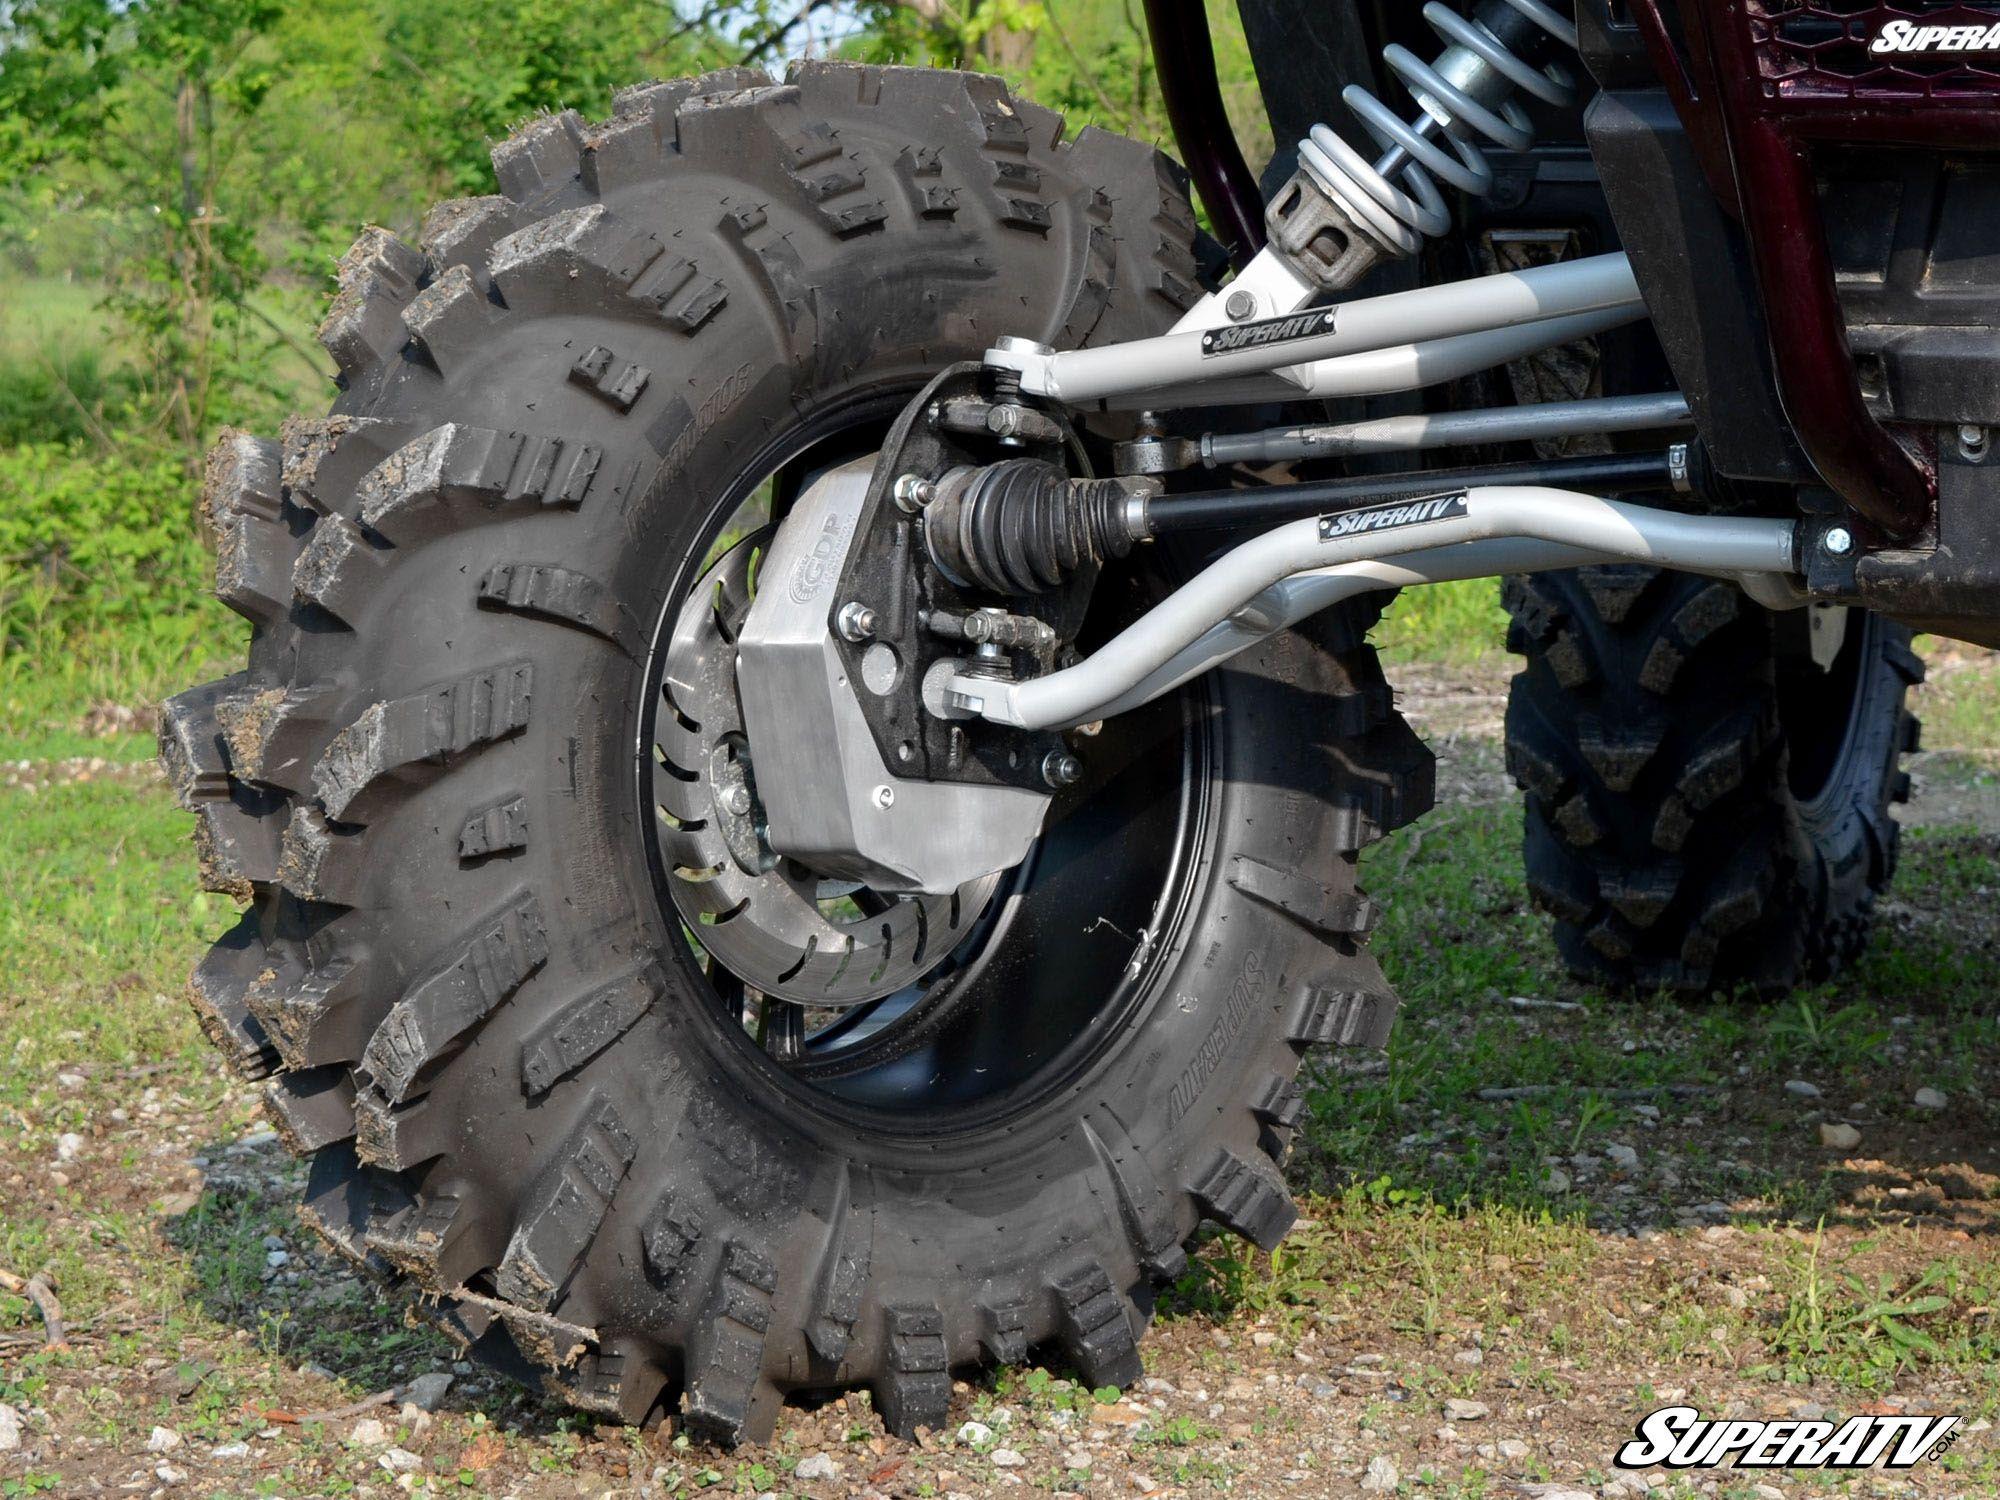 Atv Turbo Kit : Superatv polaris rzr xp turbo ″ portal gear lift bad